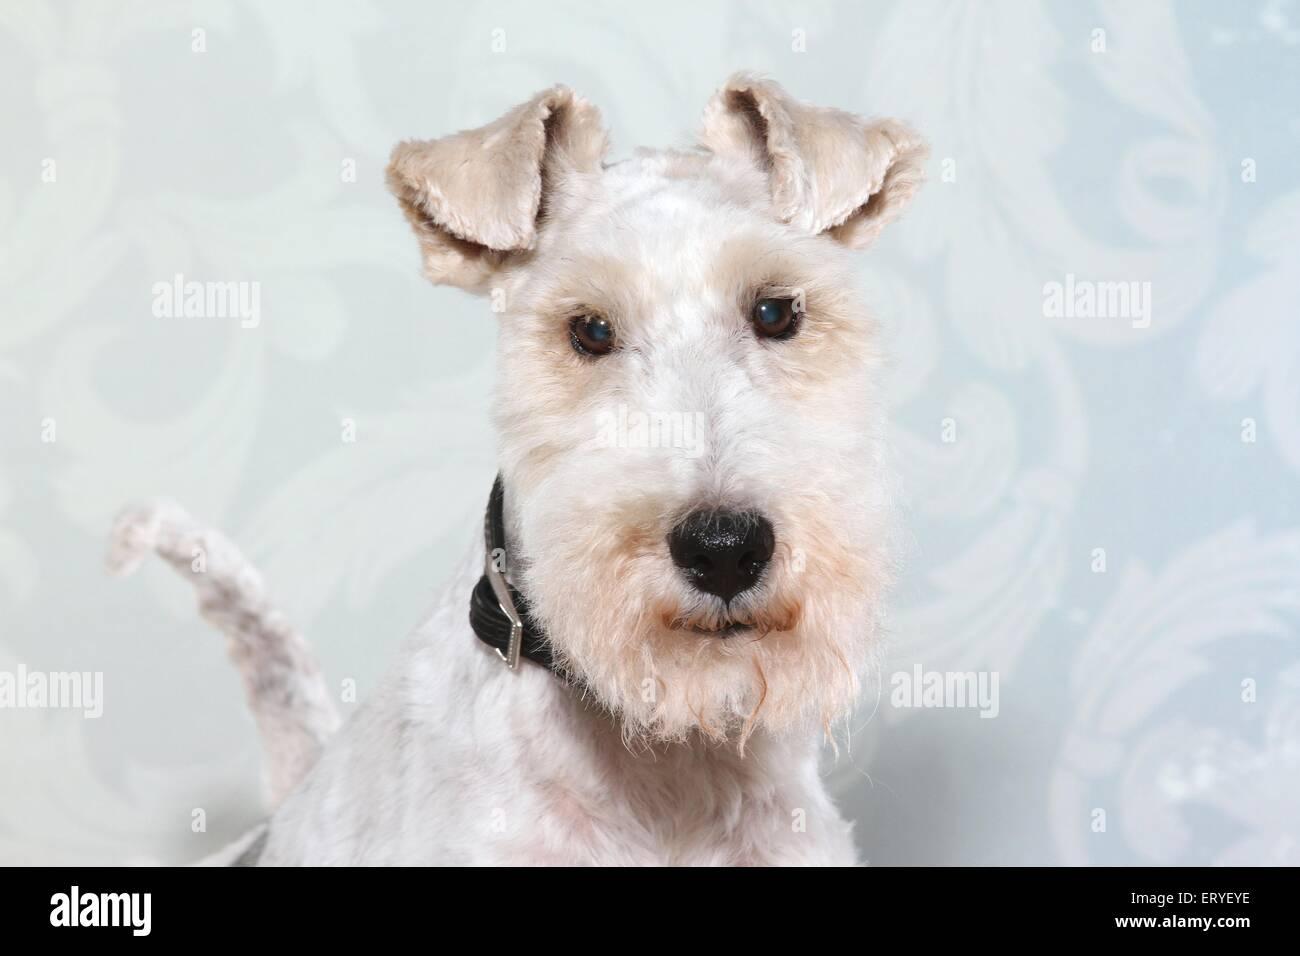 Fox Terrier Portrait Stock Photo, Royalty Free Image: 83583010 - Alamy